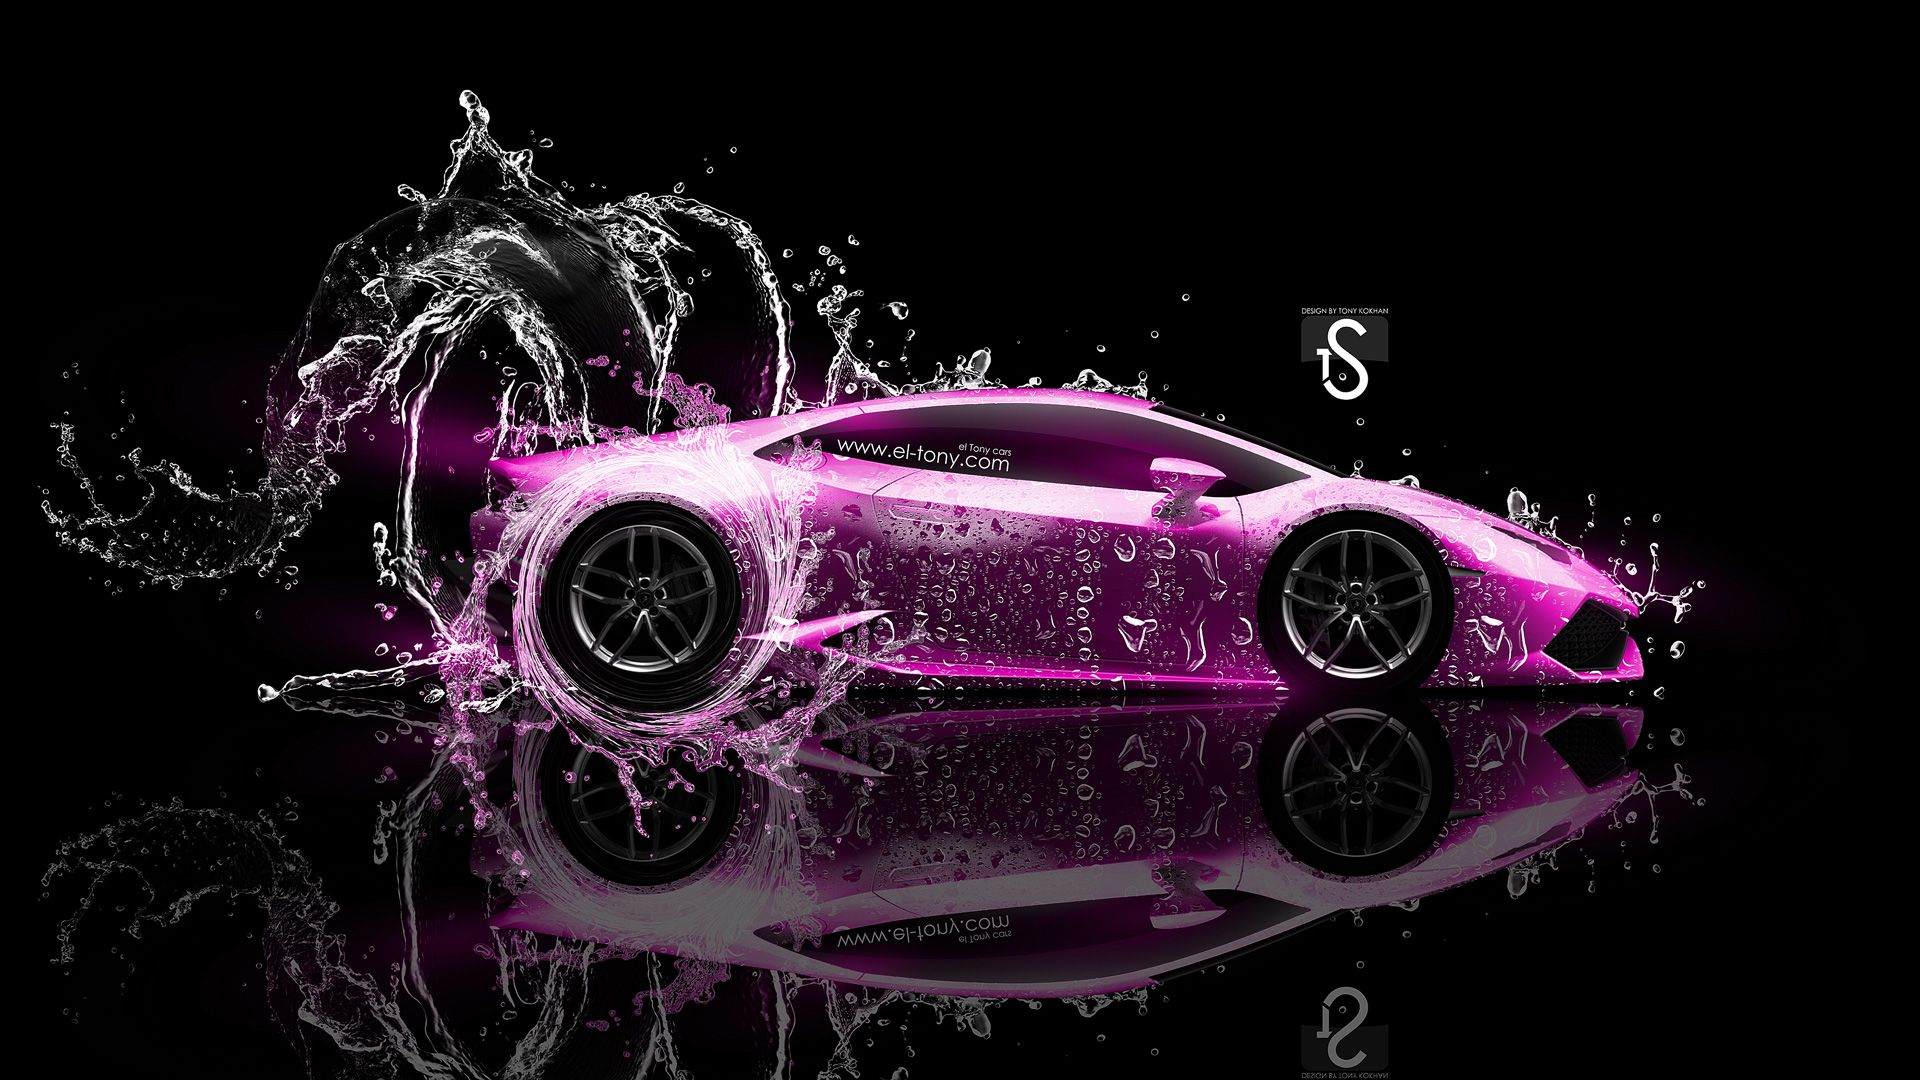 Elegant Lamborghini Huracan Tuning Front Water Car 2014   Lamborghini Huracan  Fantasy Plastic Bull Car Huracan Tuning Front Crystal City Car IPhone X  Back Logo ...